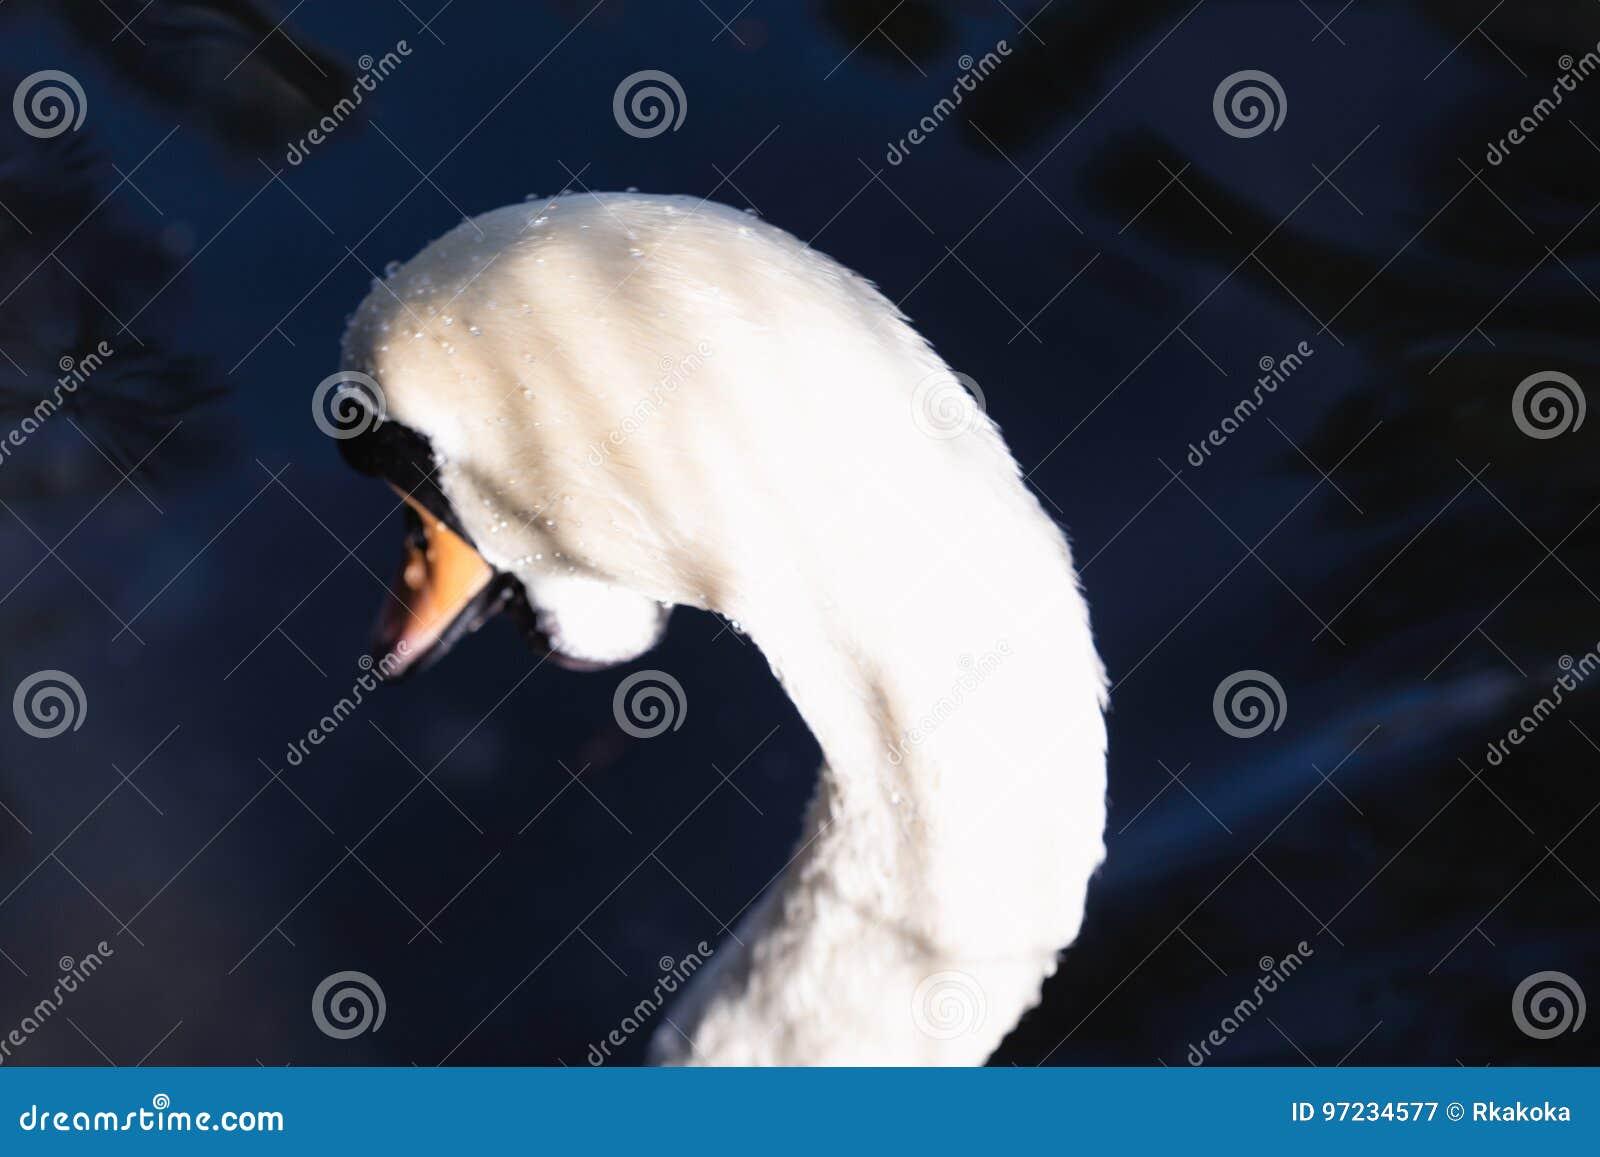 Beautiful abstract surreal white swan looking away at deep dark